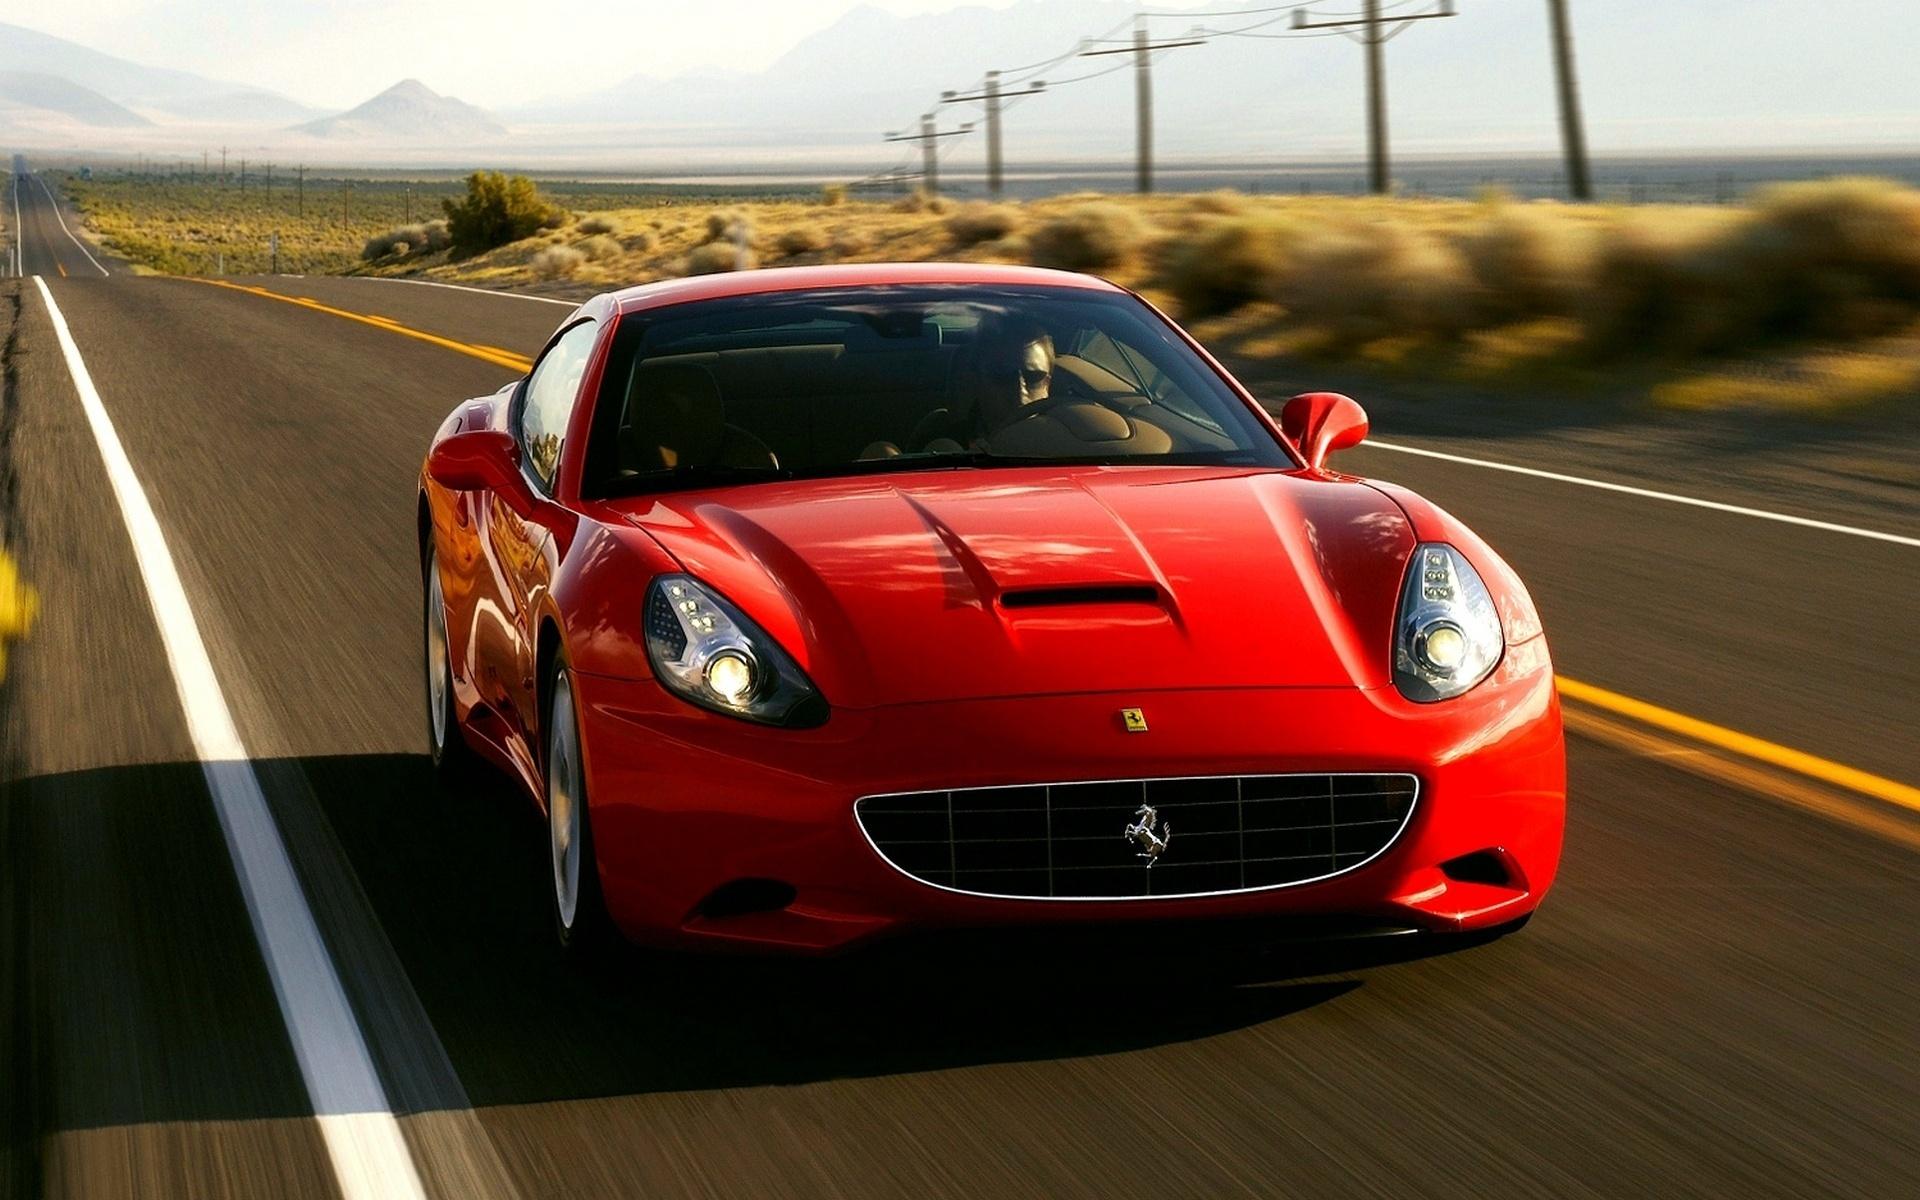 Ferrari California Wallpapers Pictures Images